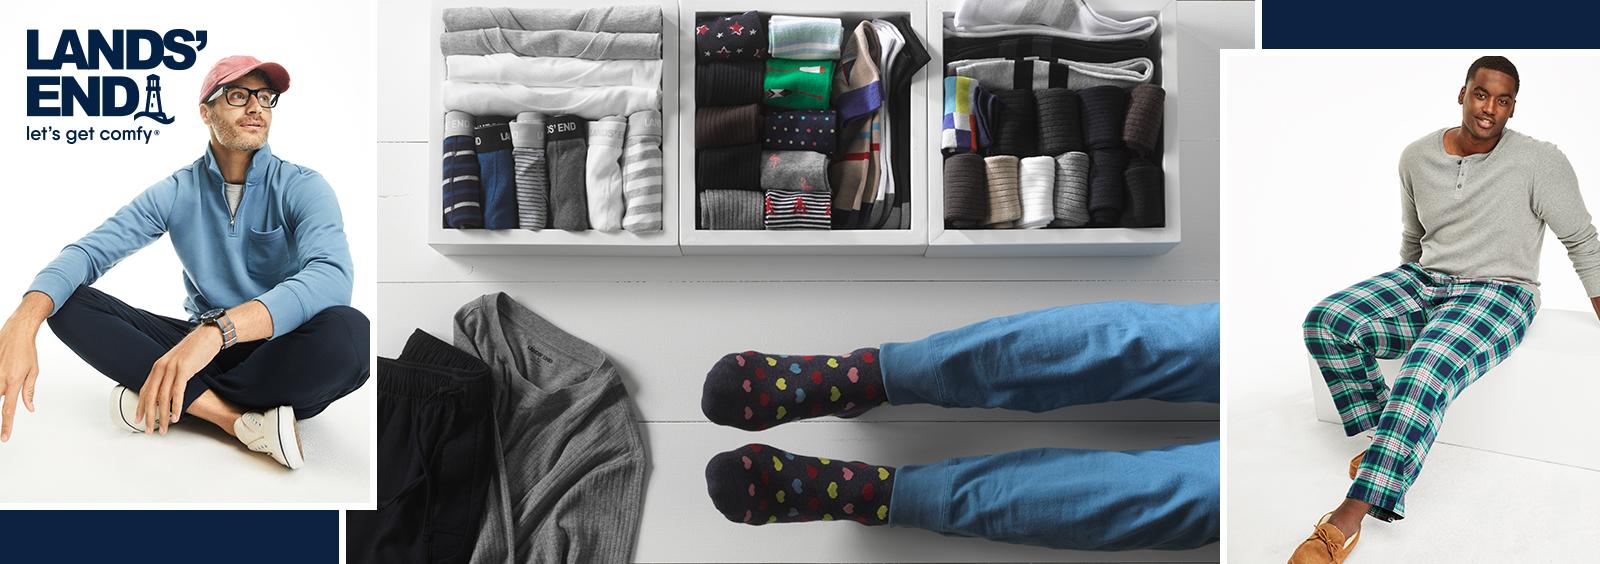 5 Comfiest Big & Tall Sweatpants for Men